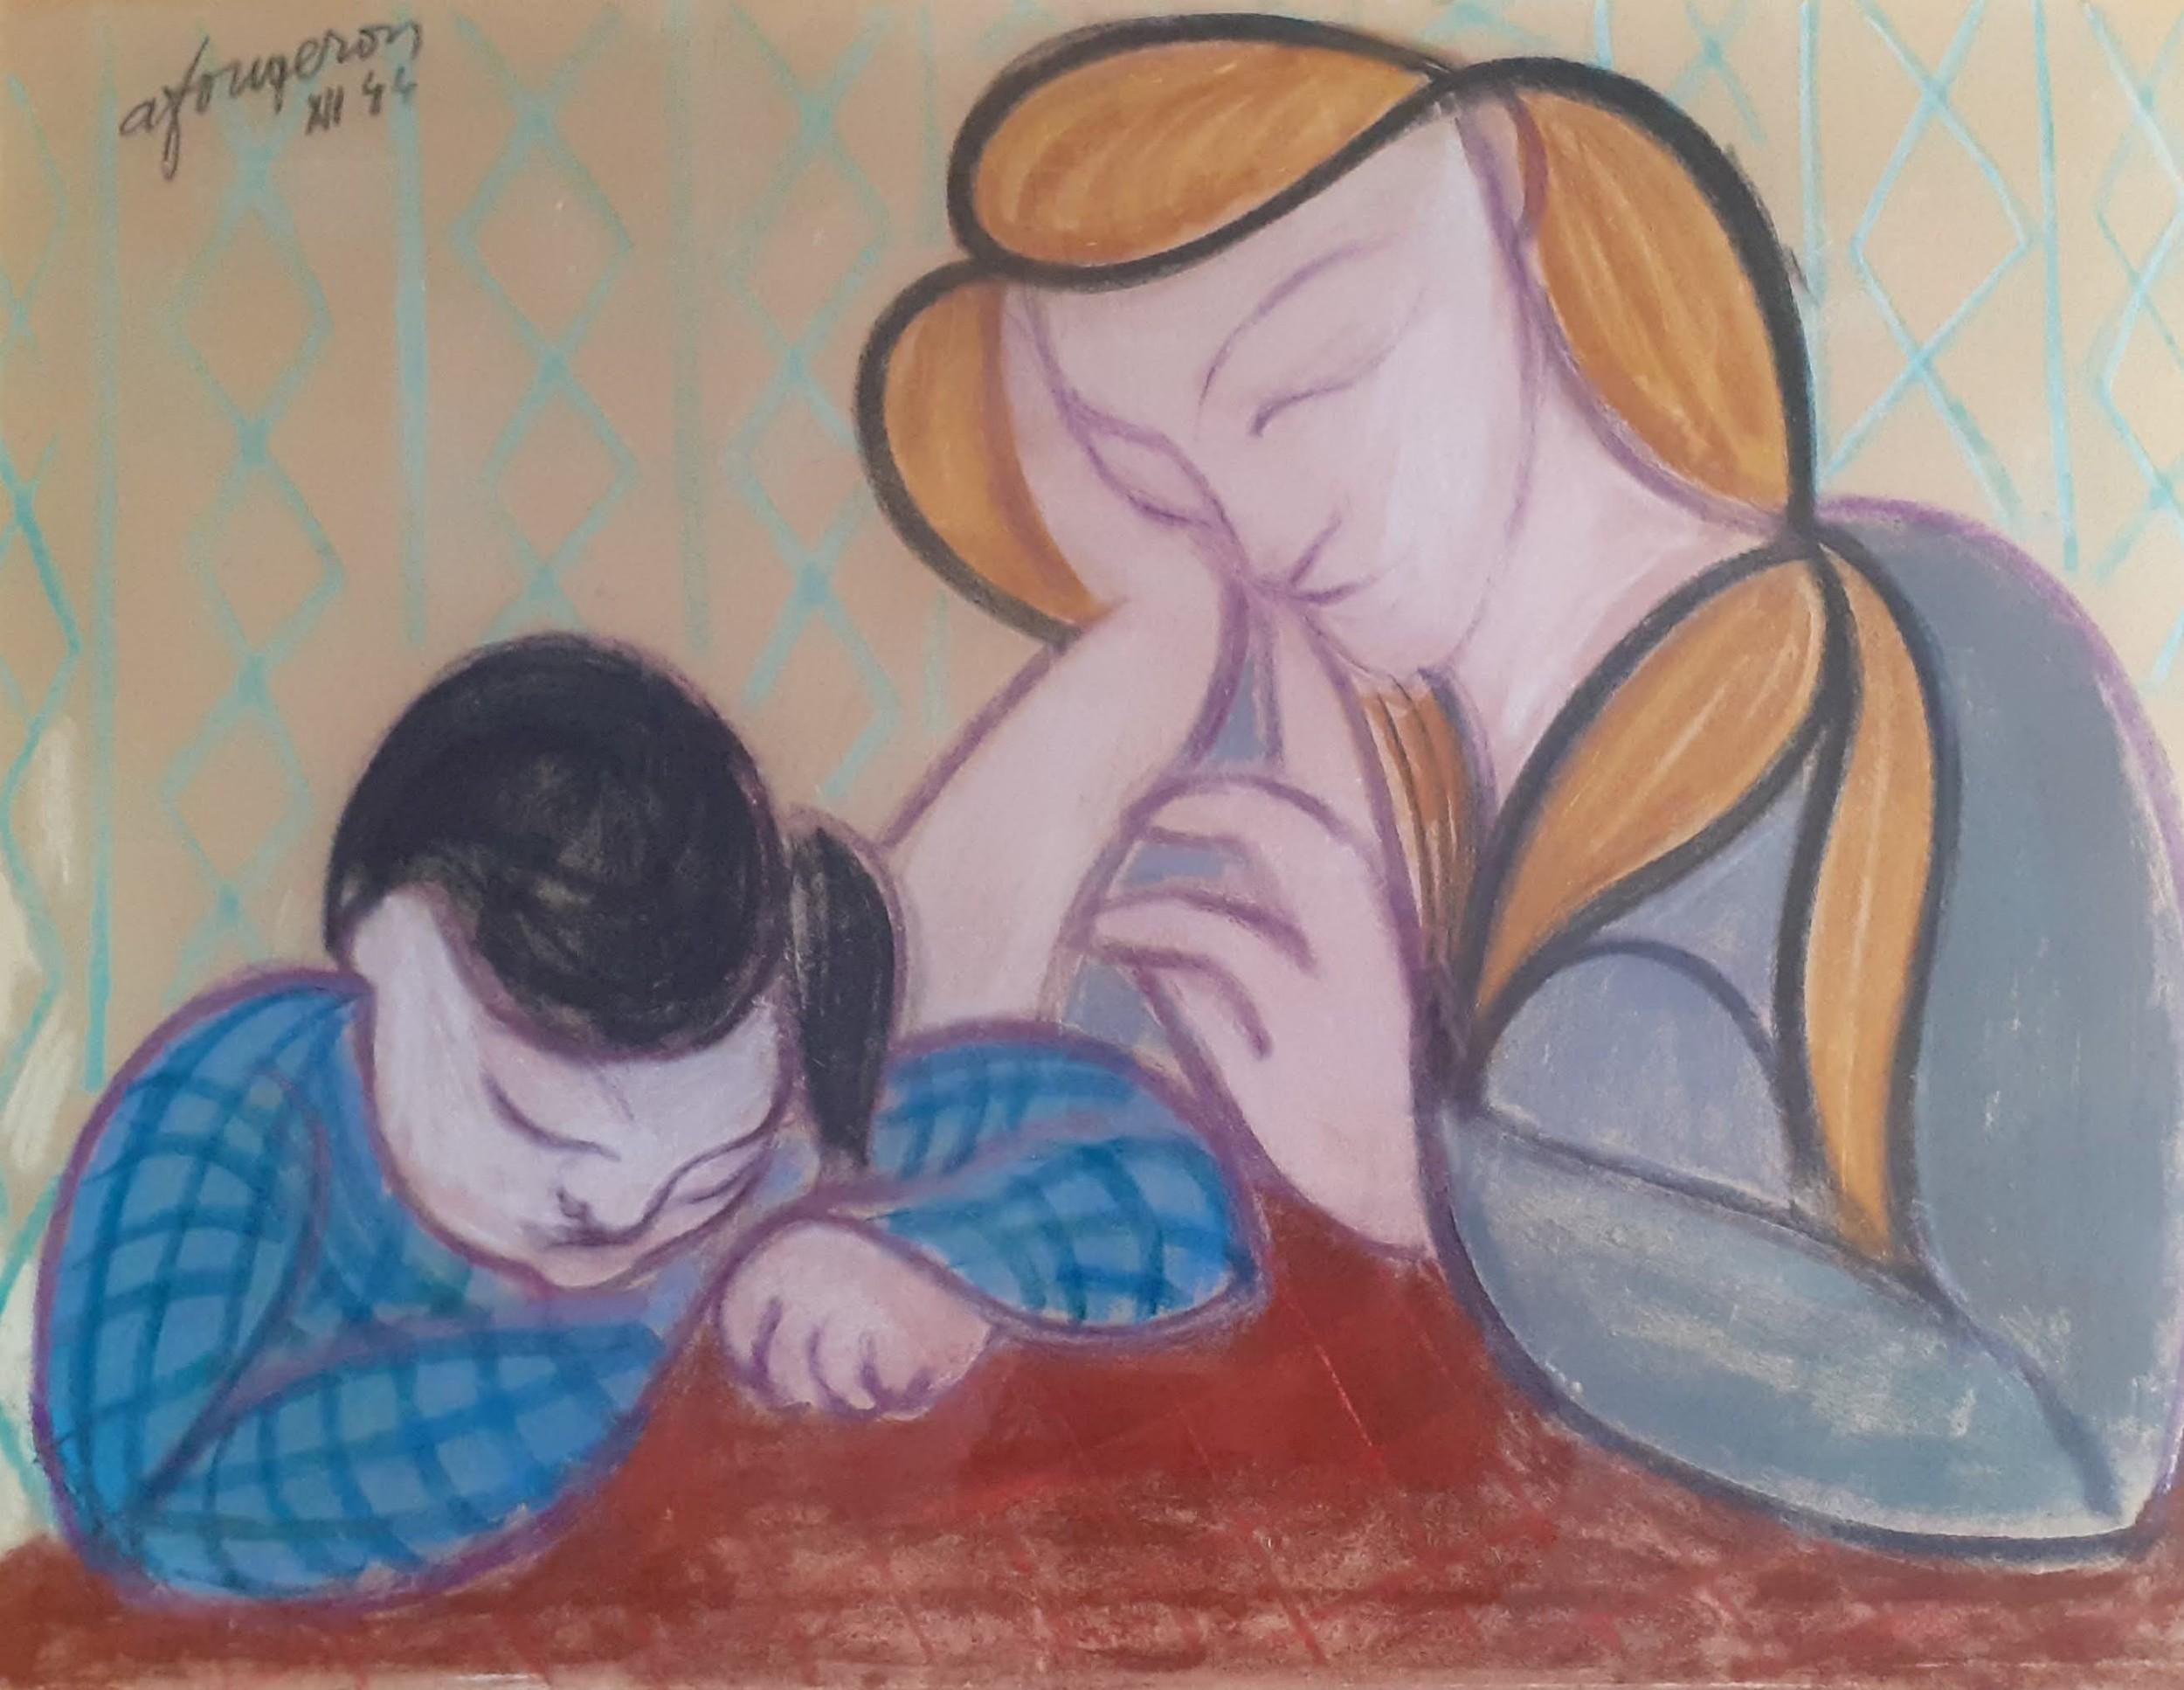 masterpiece cubist pop art precursor tate gallery artist fougeron modernist family scene wartime 1944 pastel painting